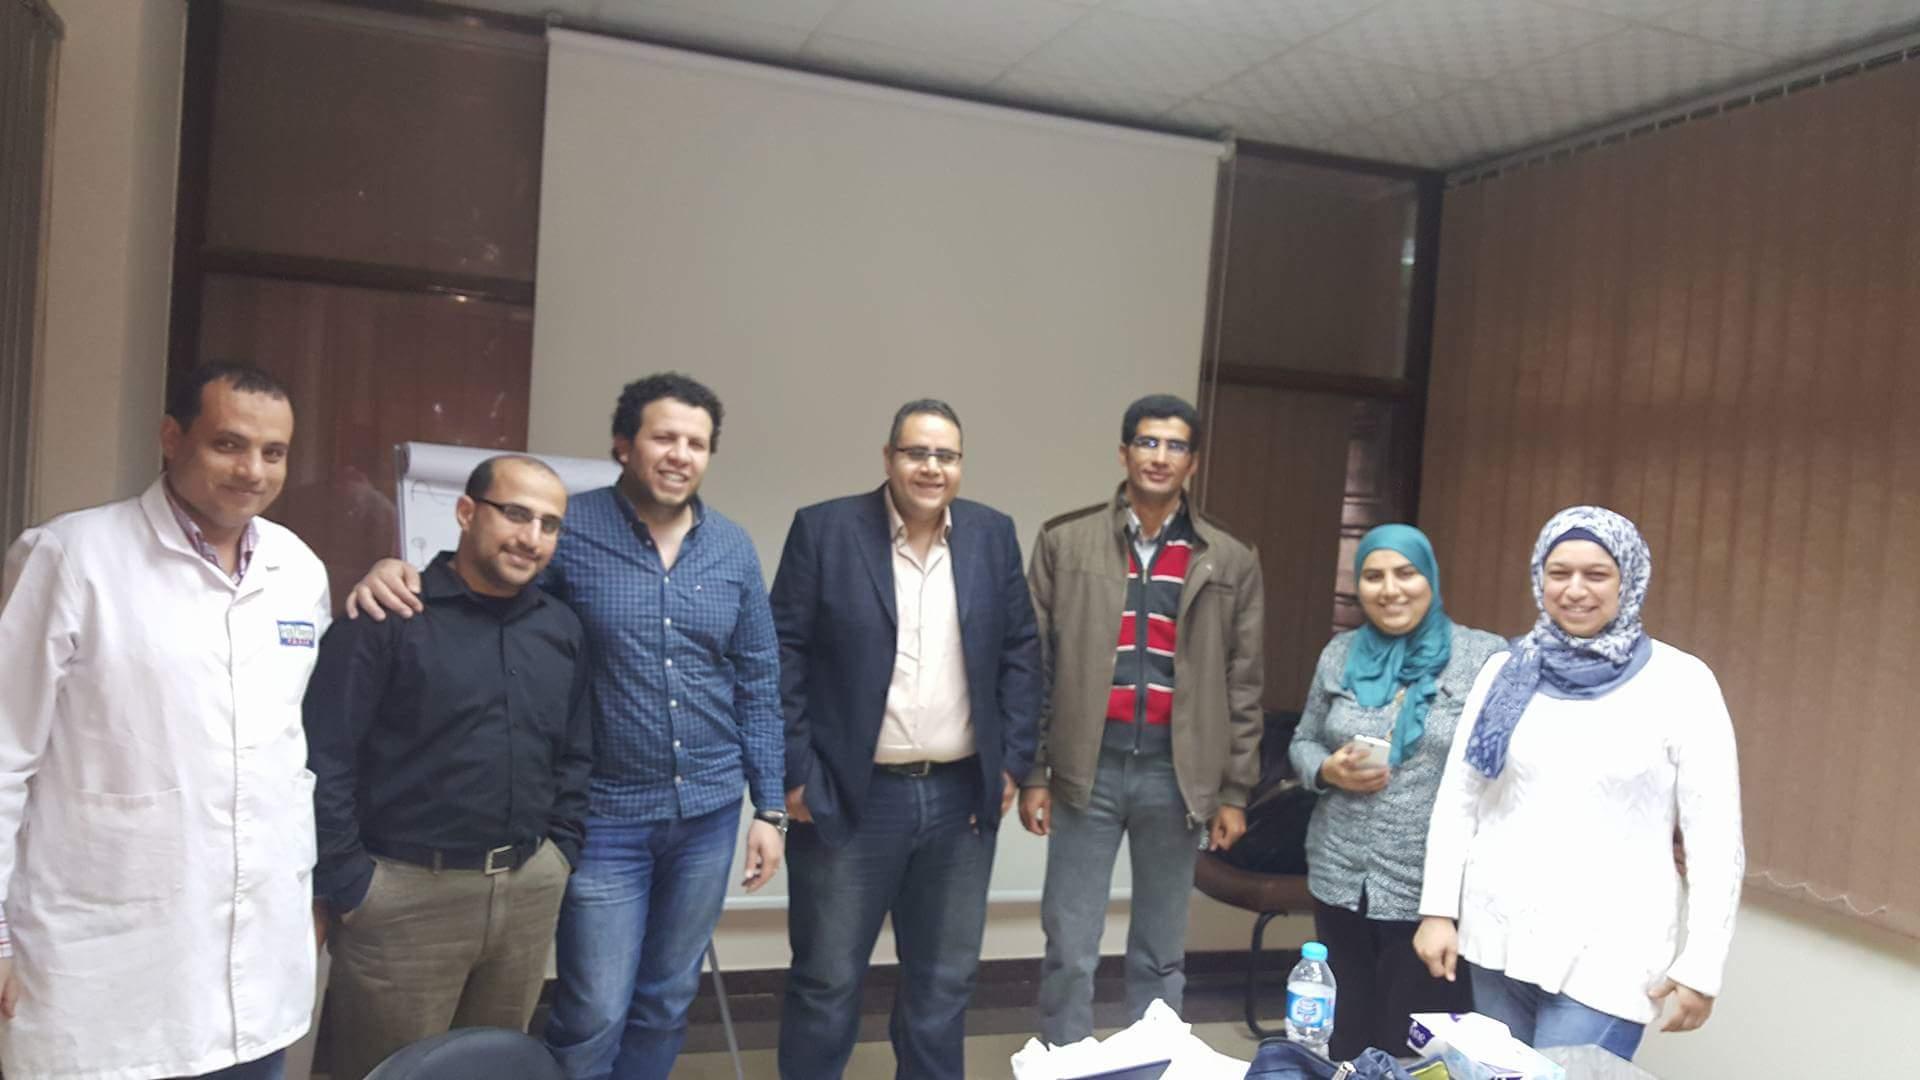 Excellence Center Egypt20160331-received_1079530508736357.jpeg .jpg